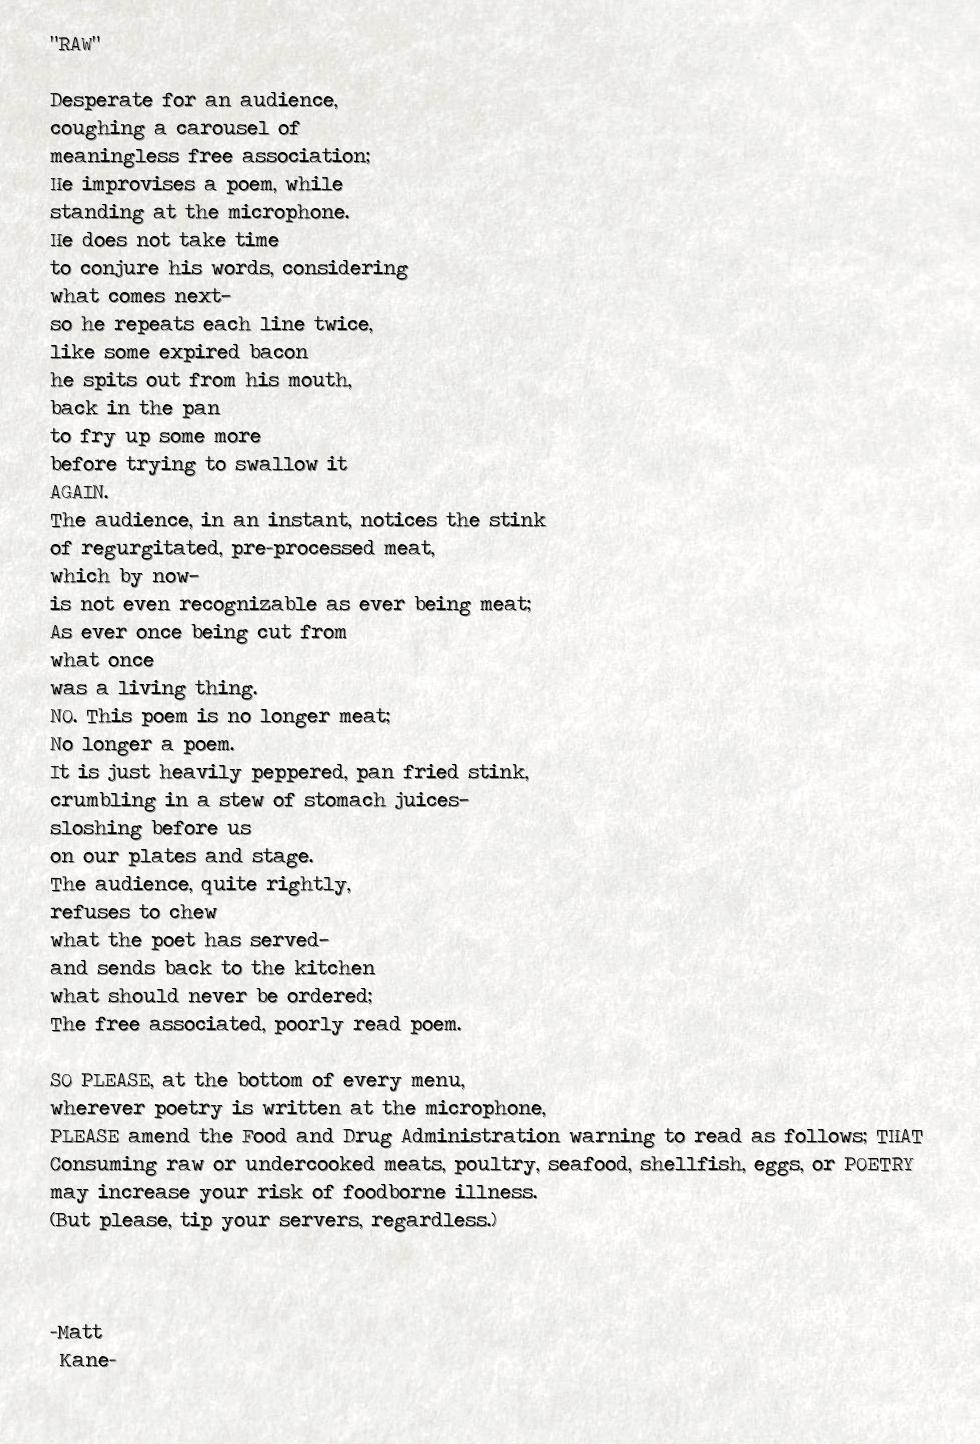 RAW - a poem by Matt Kane